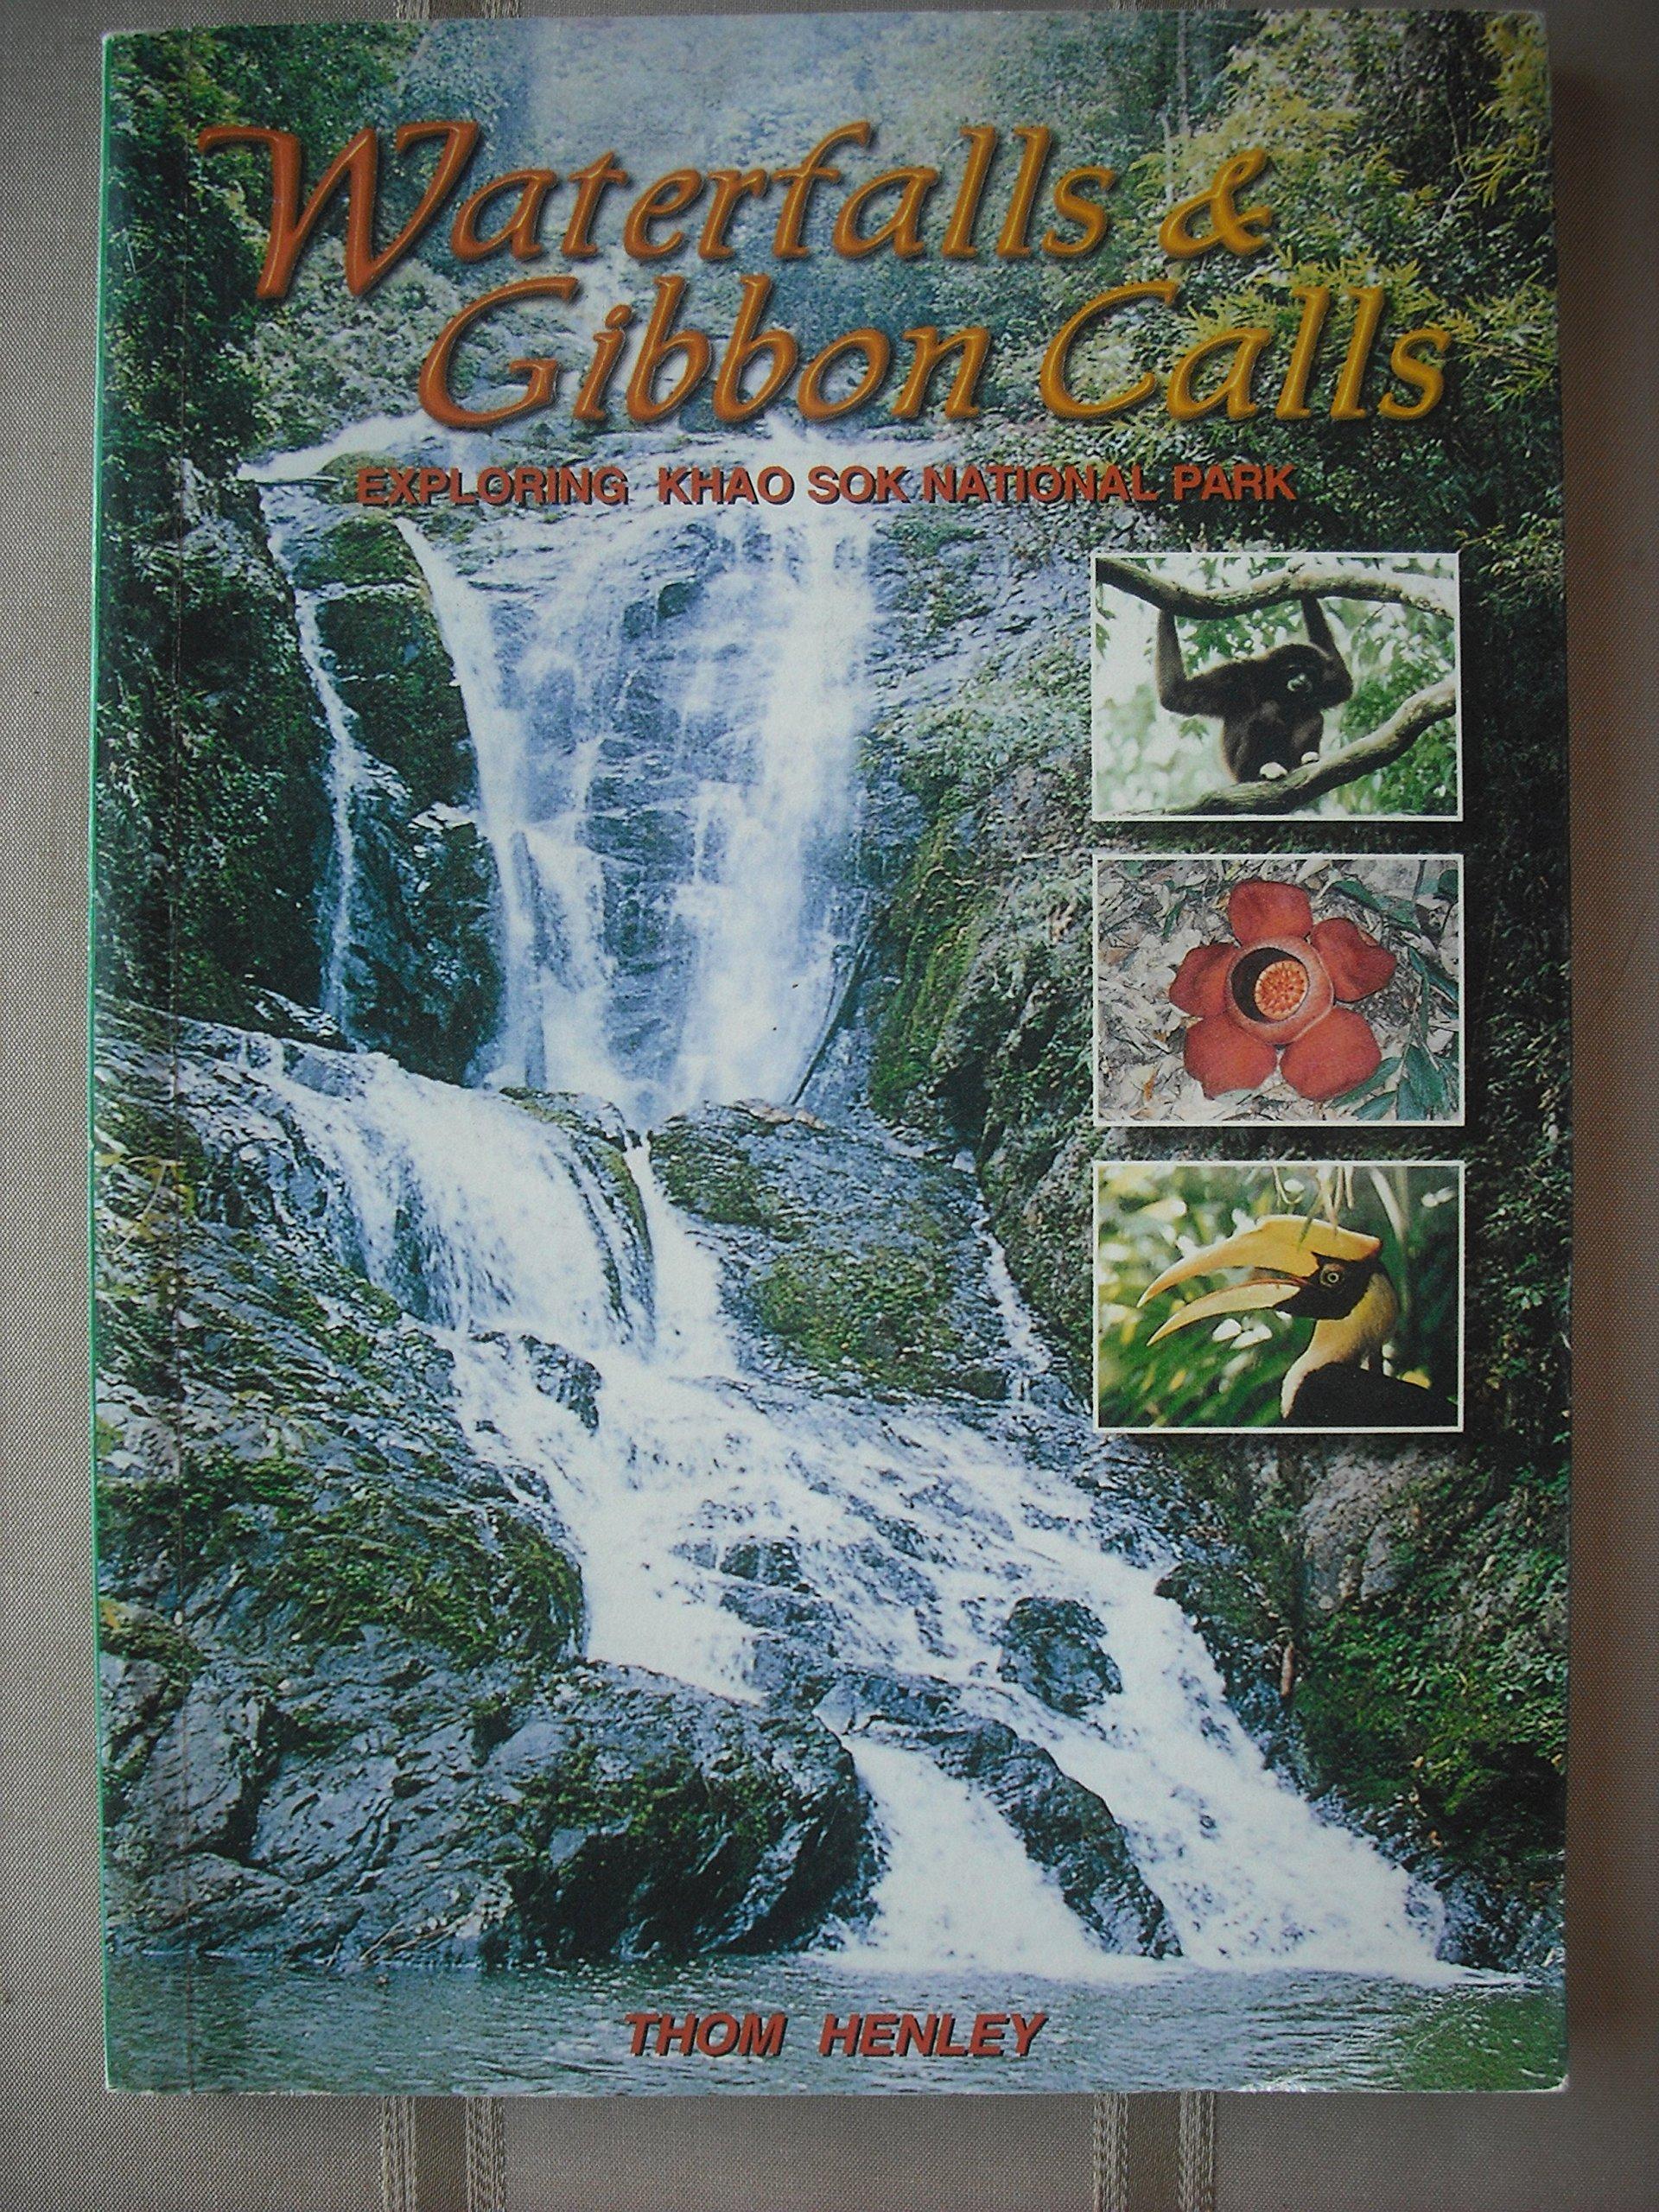 Waterfalls & Gibbon Calls Exploring Khao Sok National Park ebook